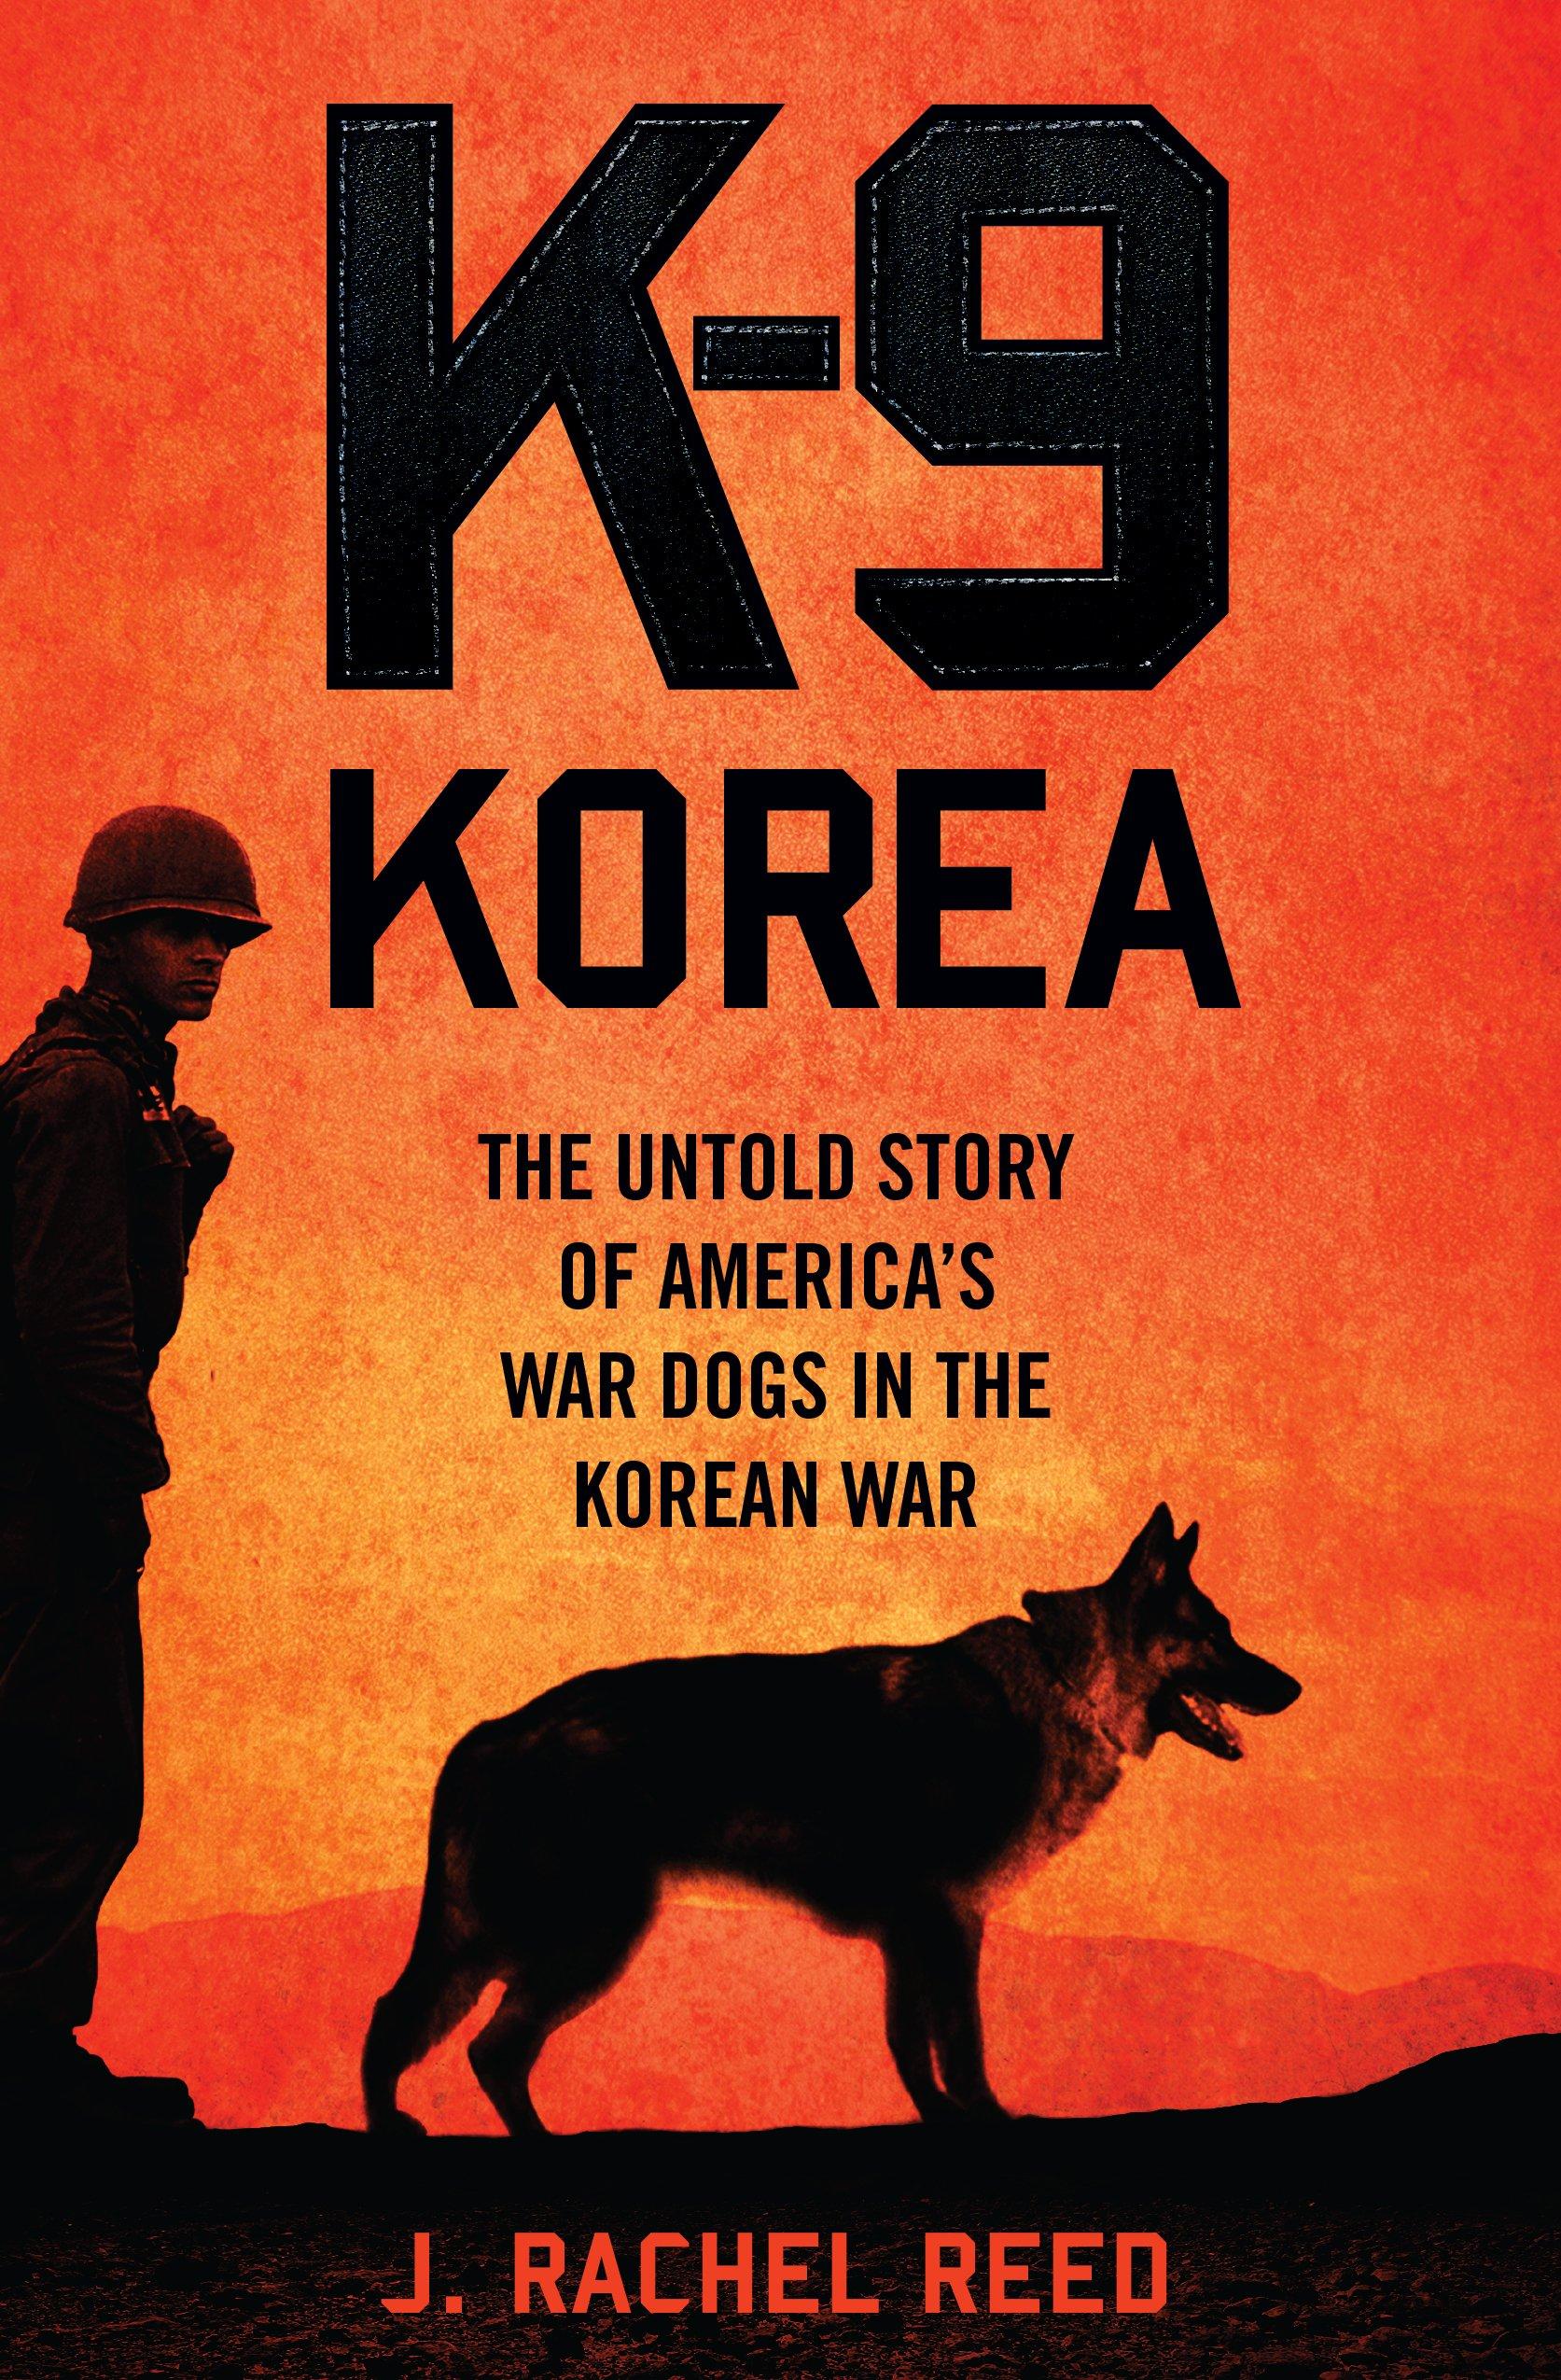 K 9 Korea Untold Americas Korean product image